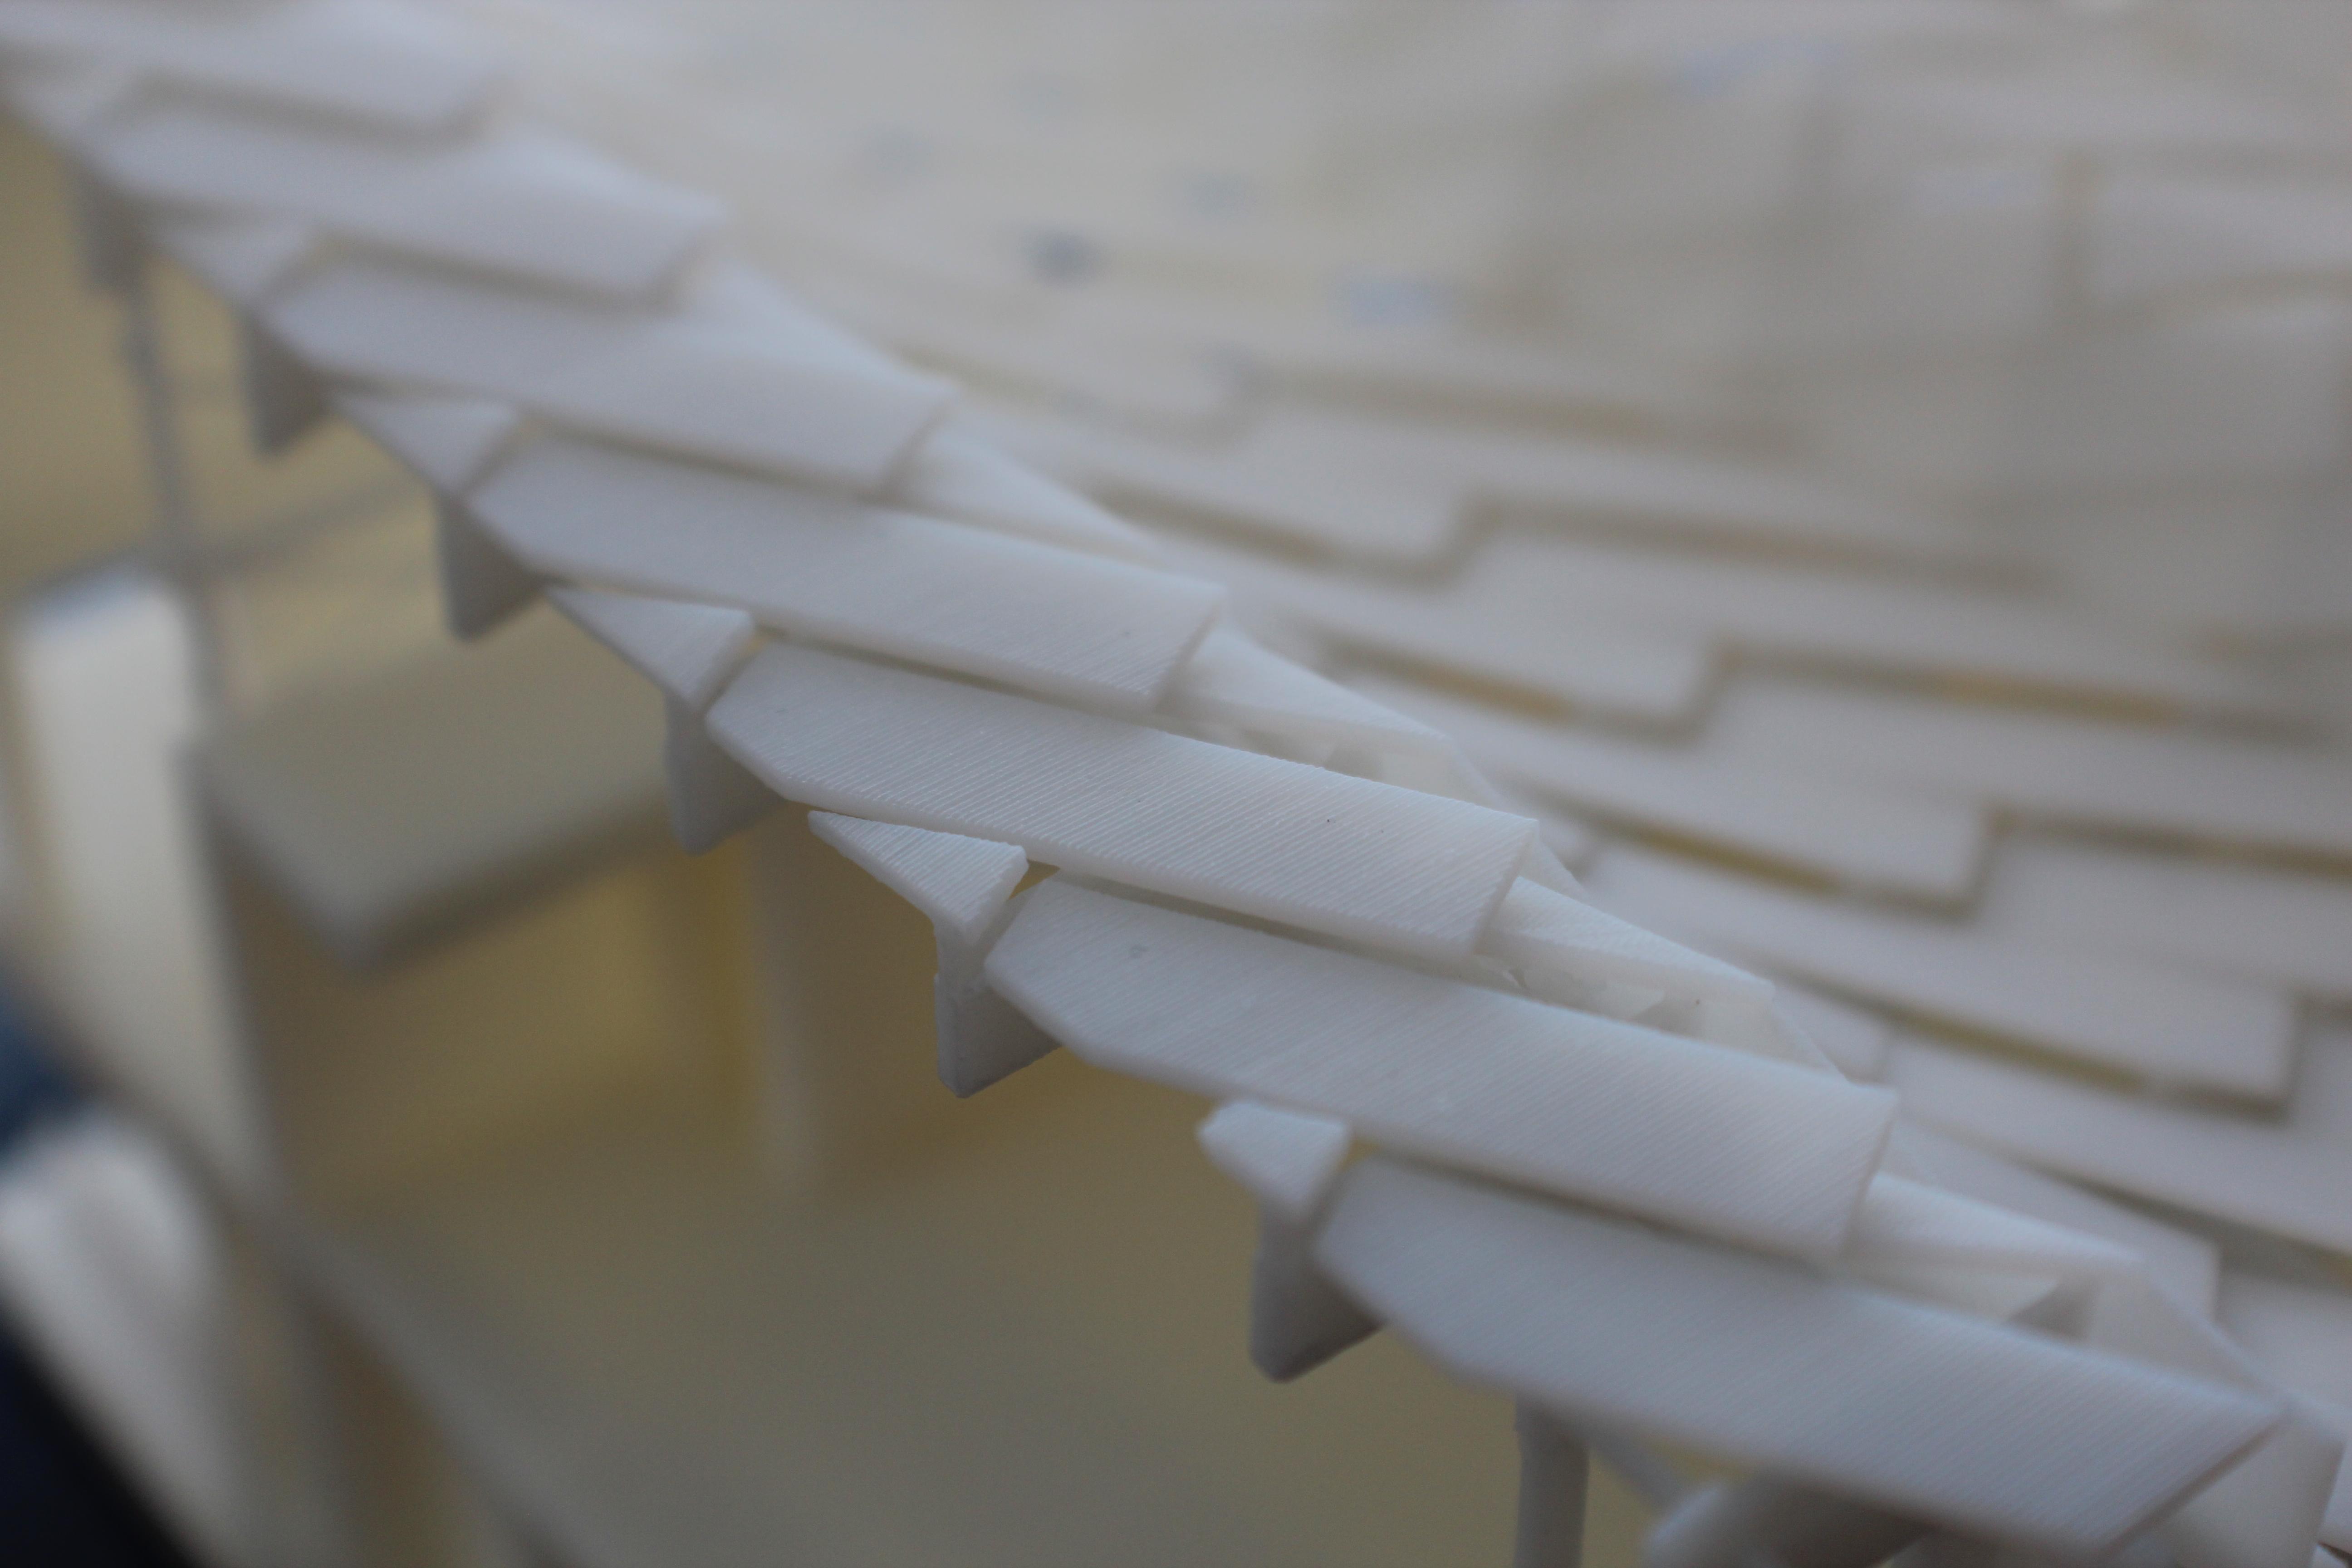 3D printed China House